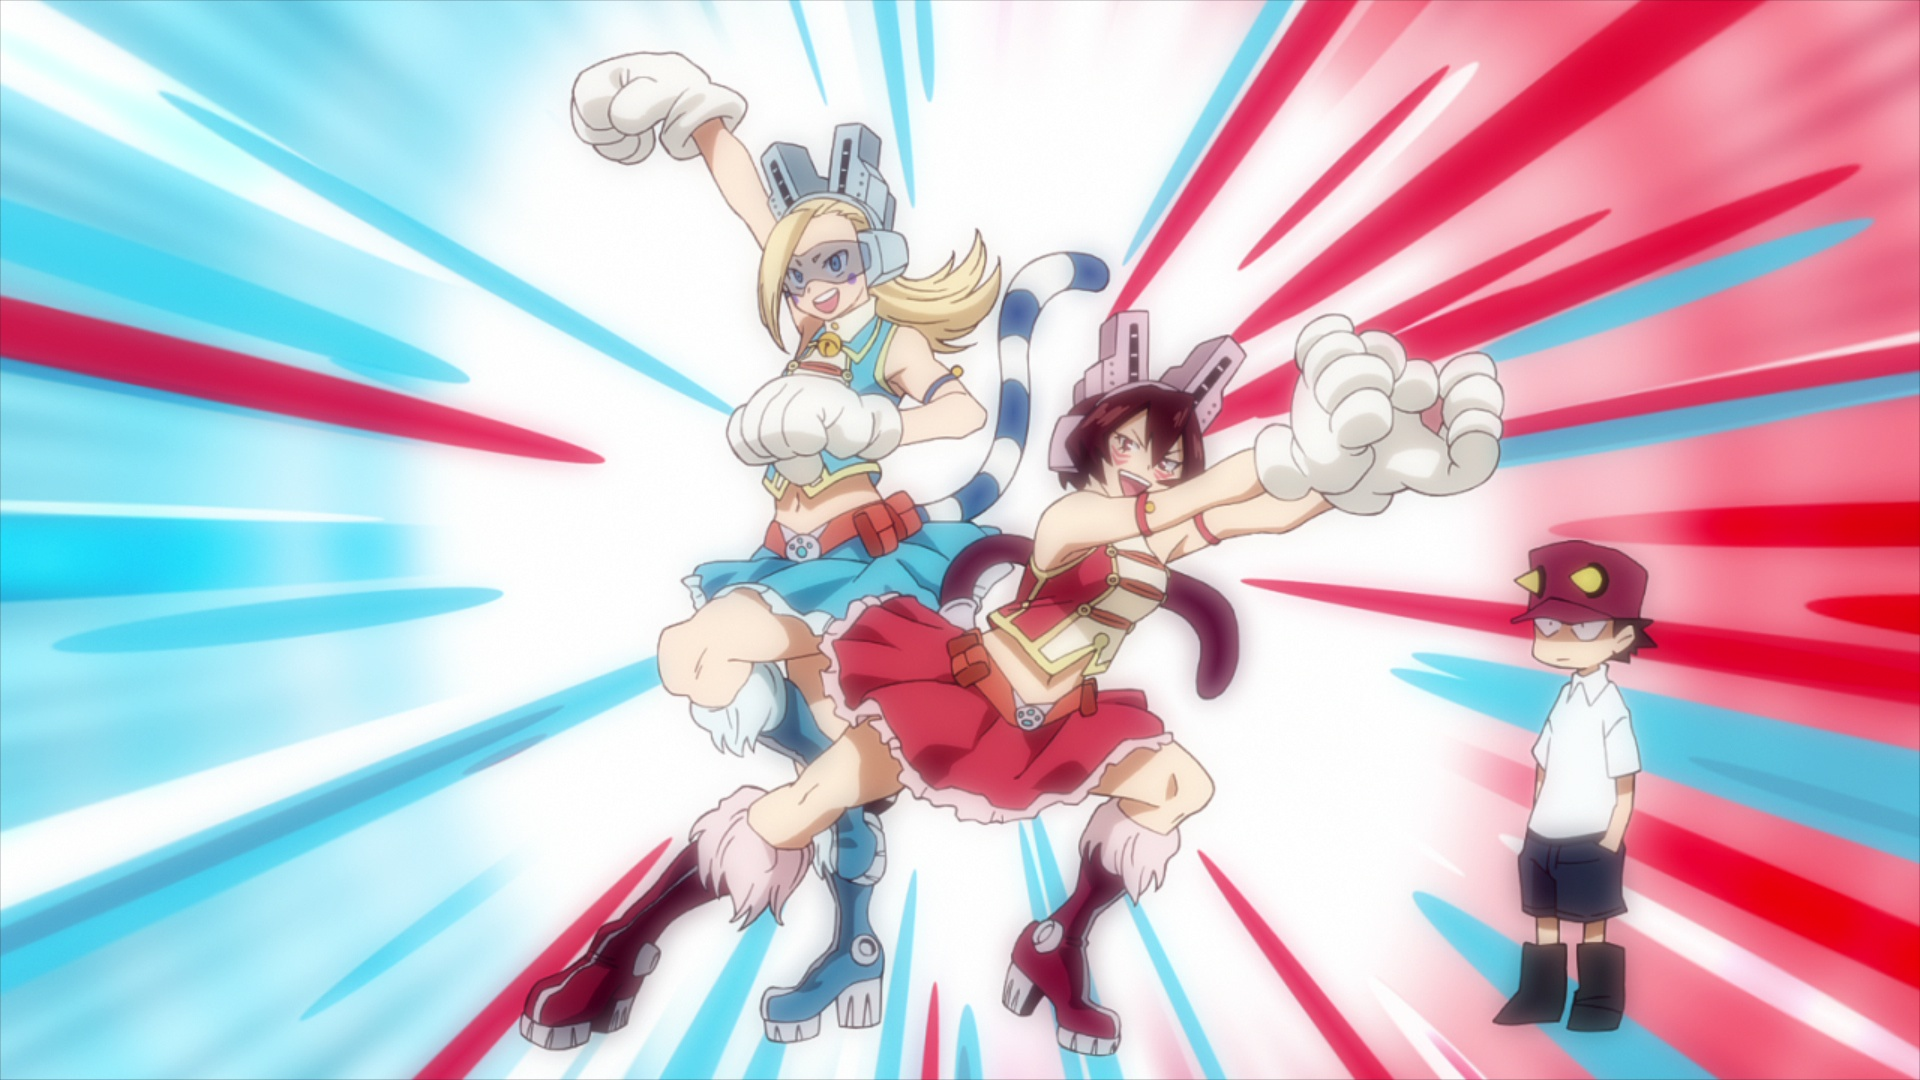 Watch My Hero Academia Season 3 Episode 40 Sub & Dub | Anime